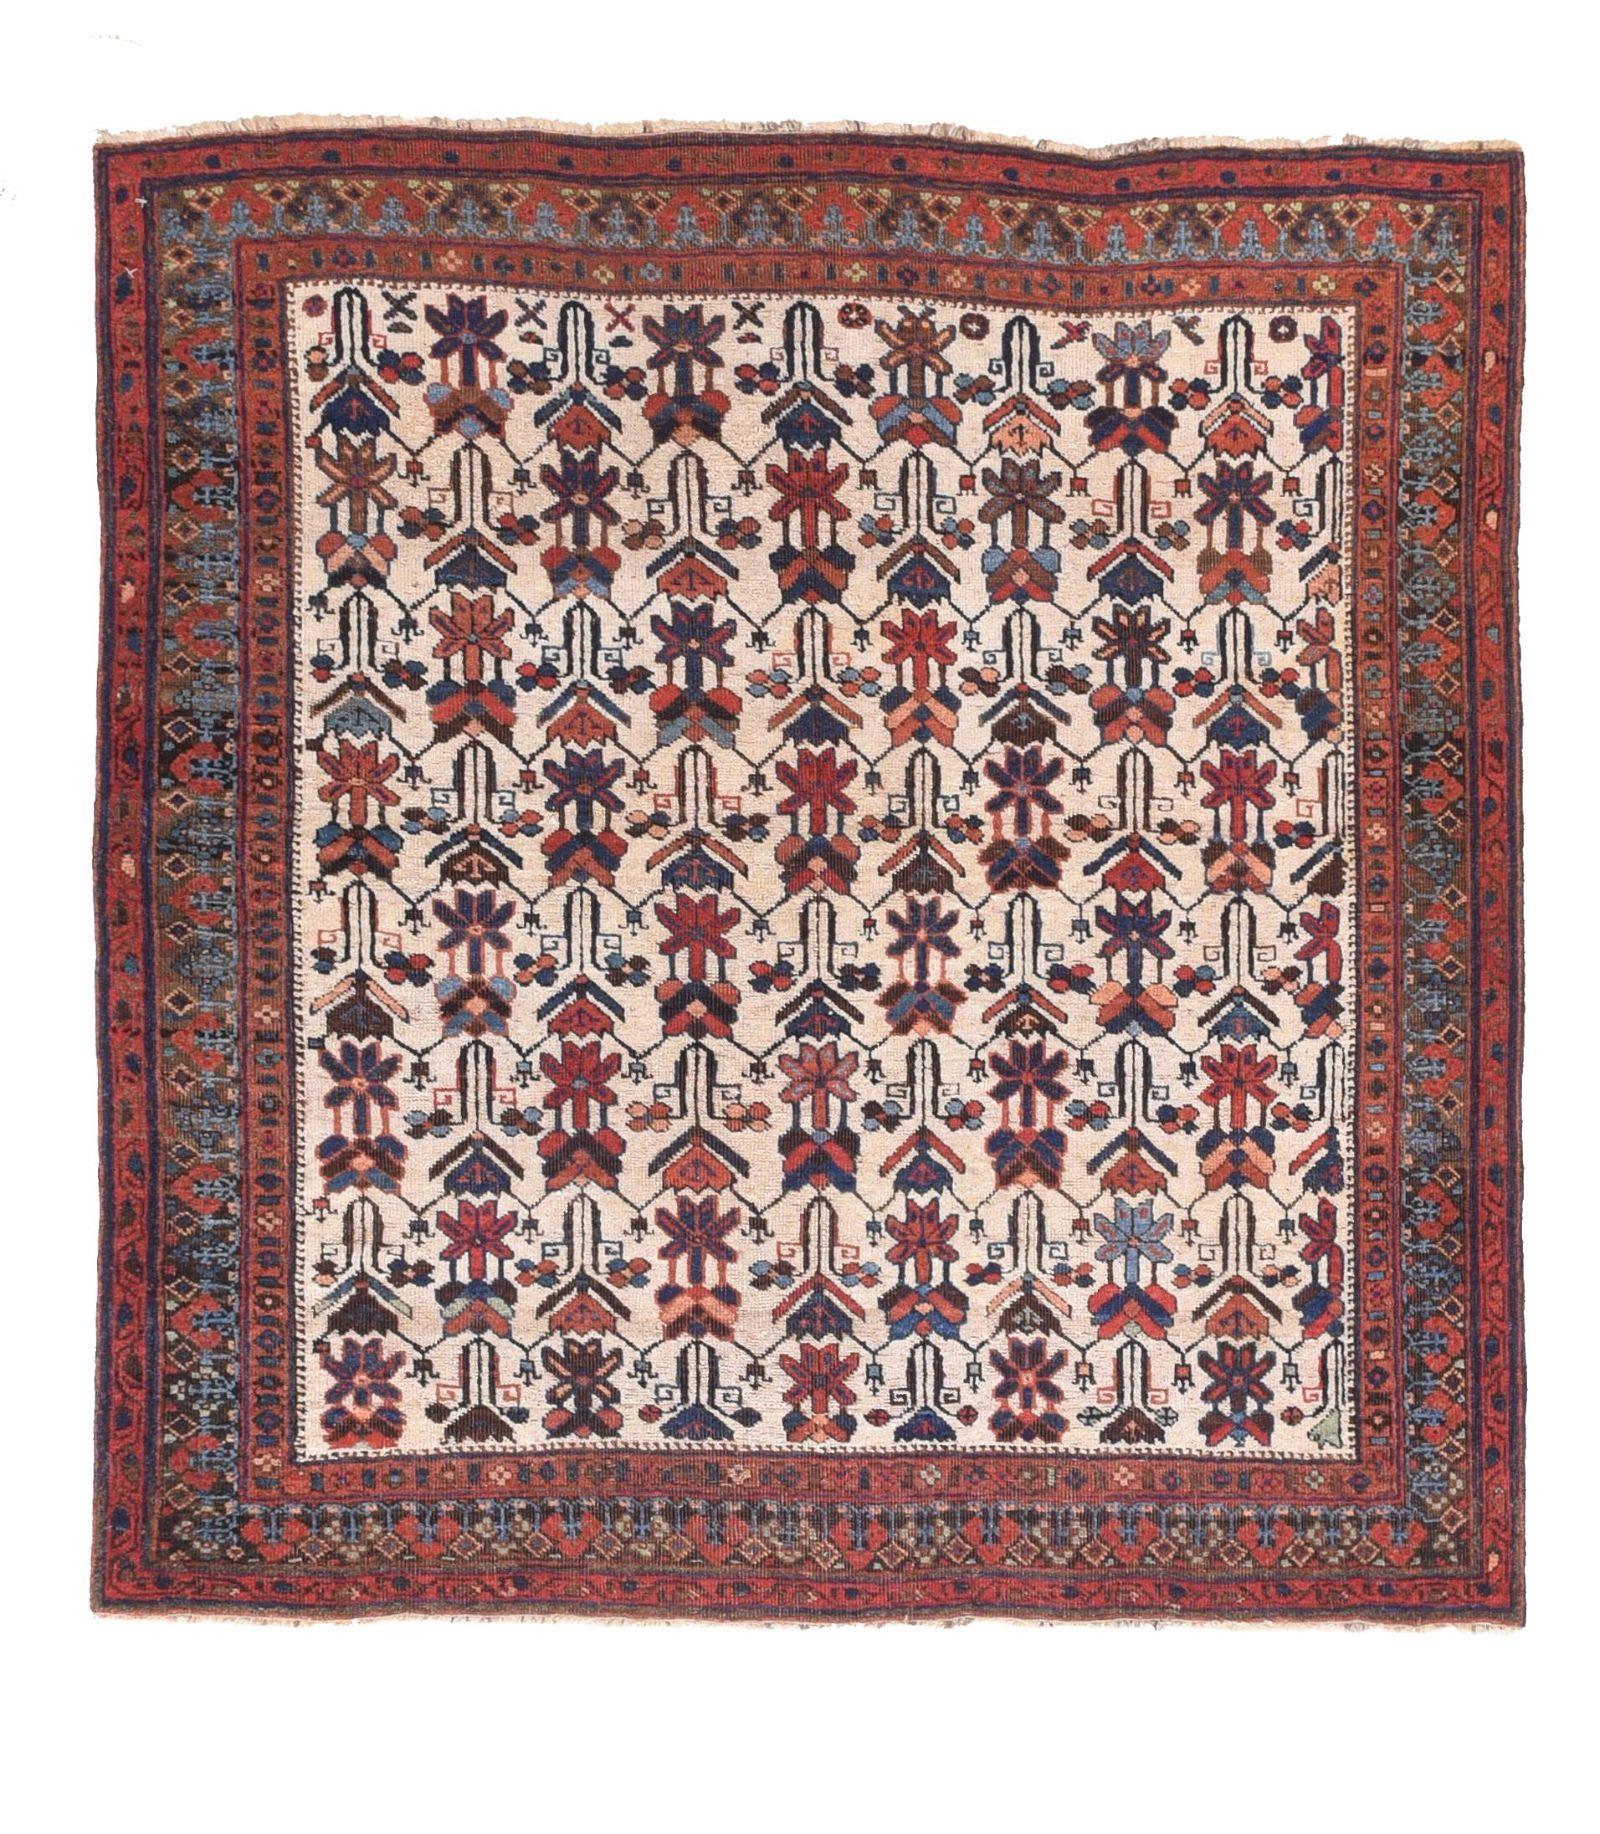 Antique Afshar Persian Area Rug